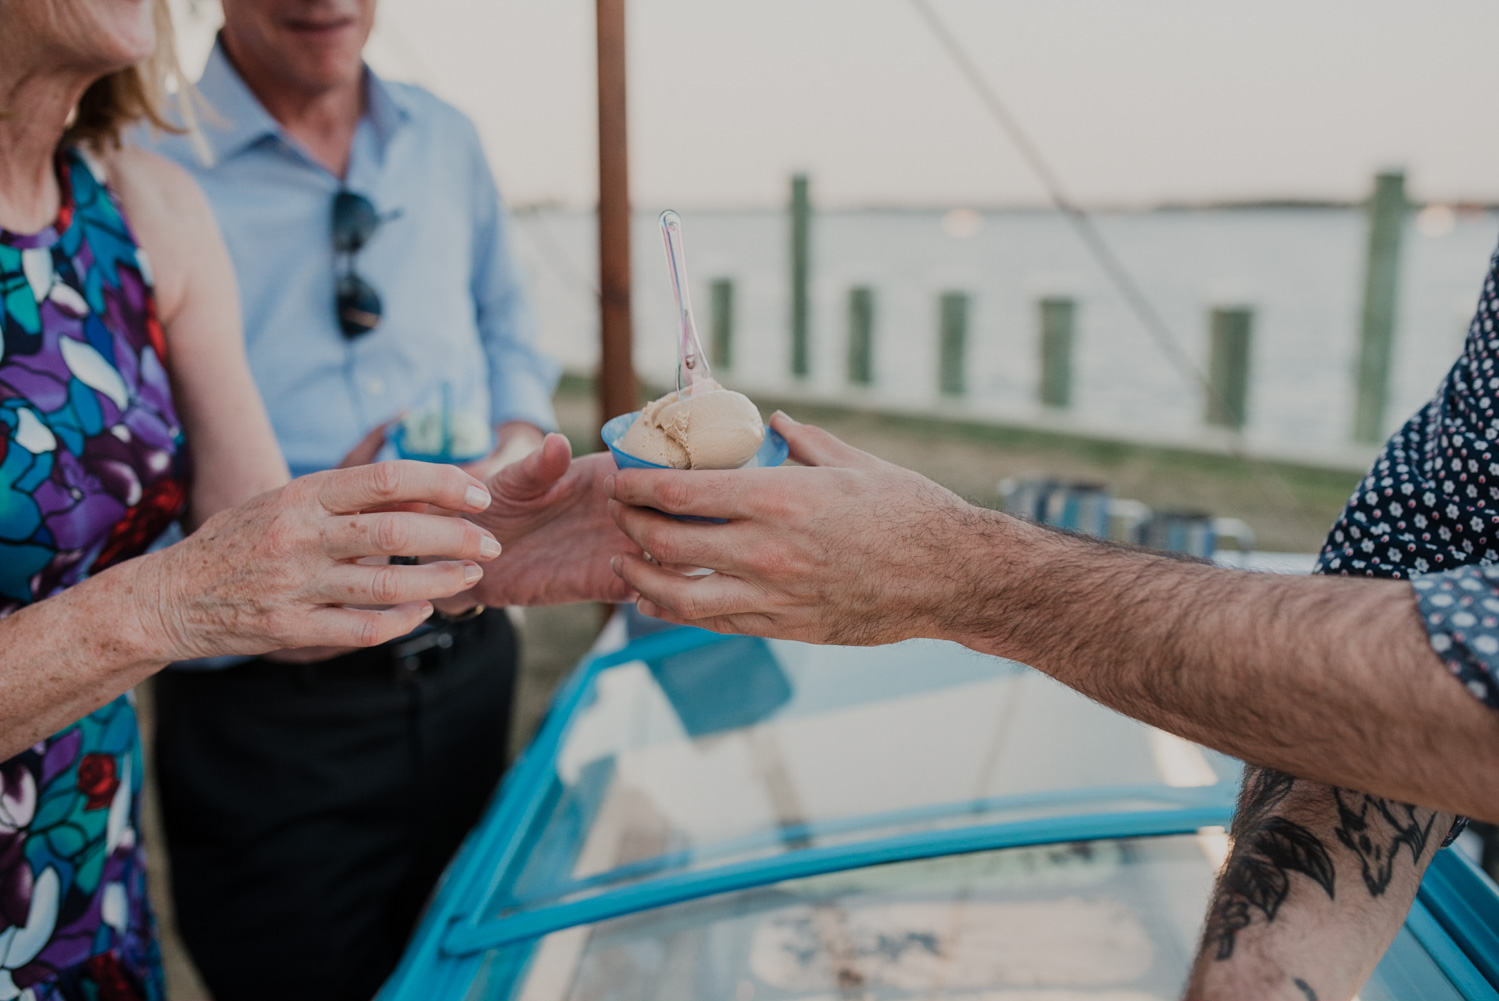 scottish highland creamery hands ice cream to wedding guest